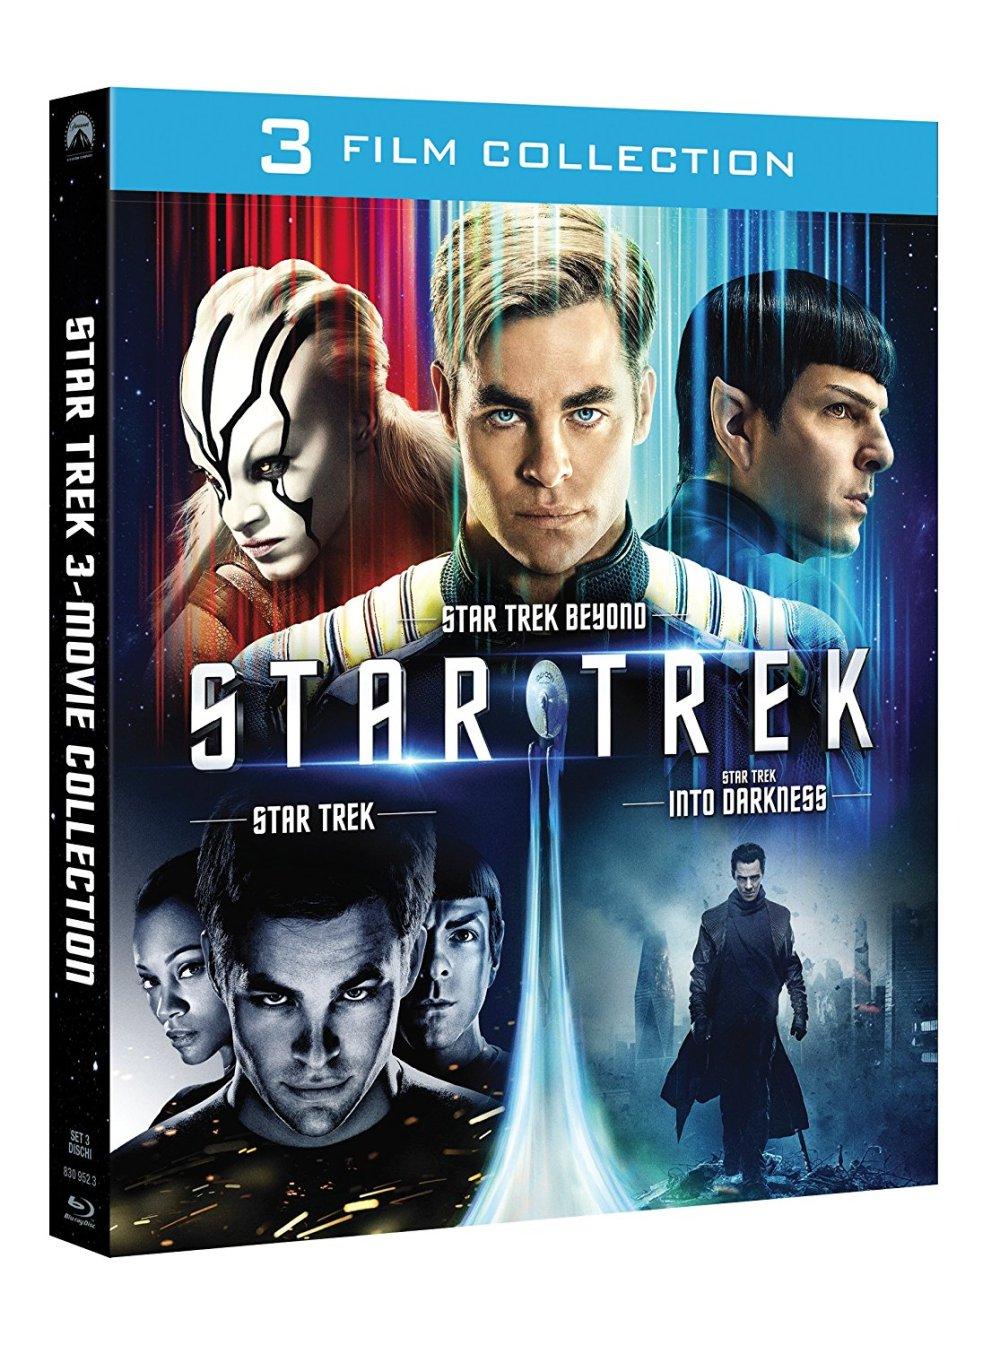 star-trek-beyond-blu-ray-collection-abrams_